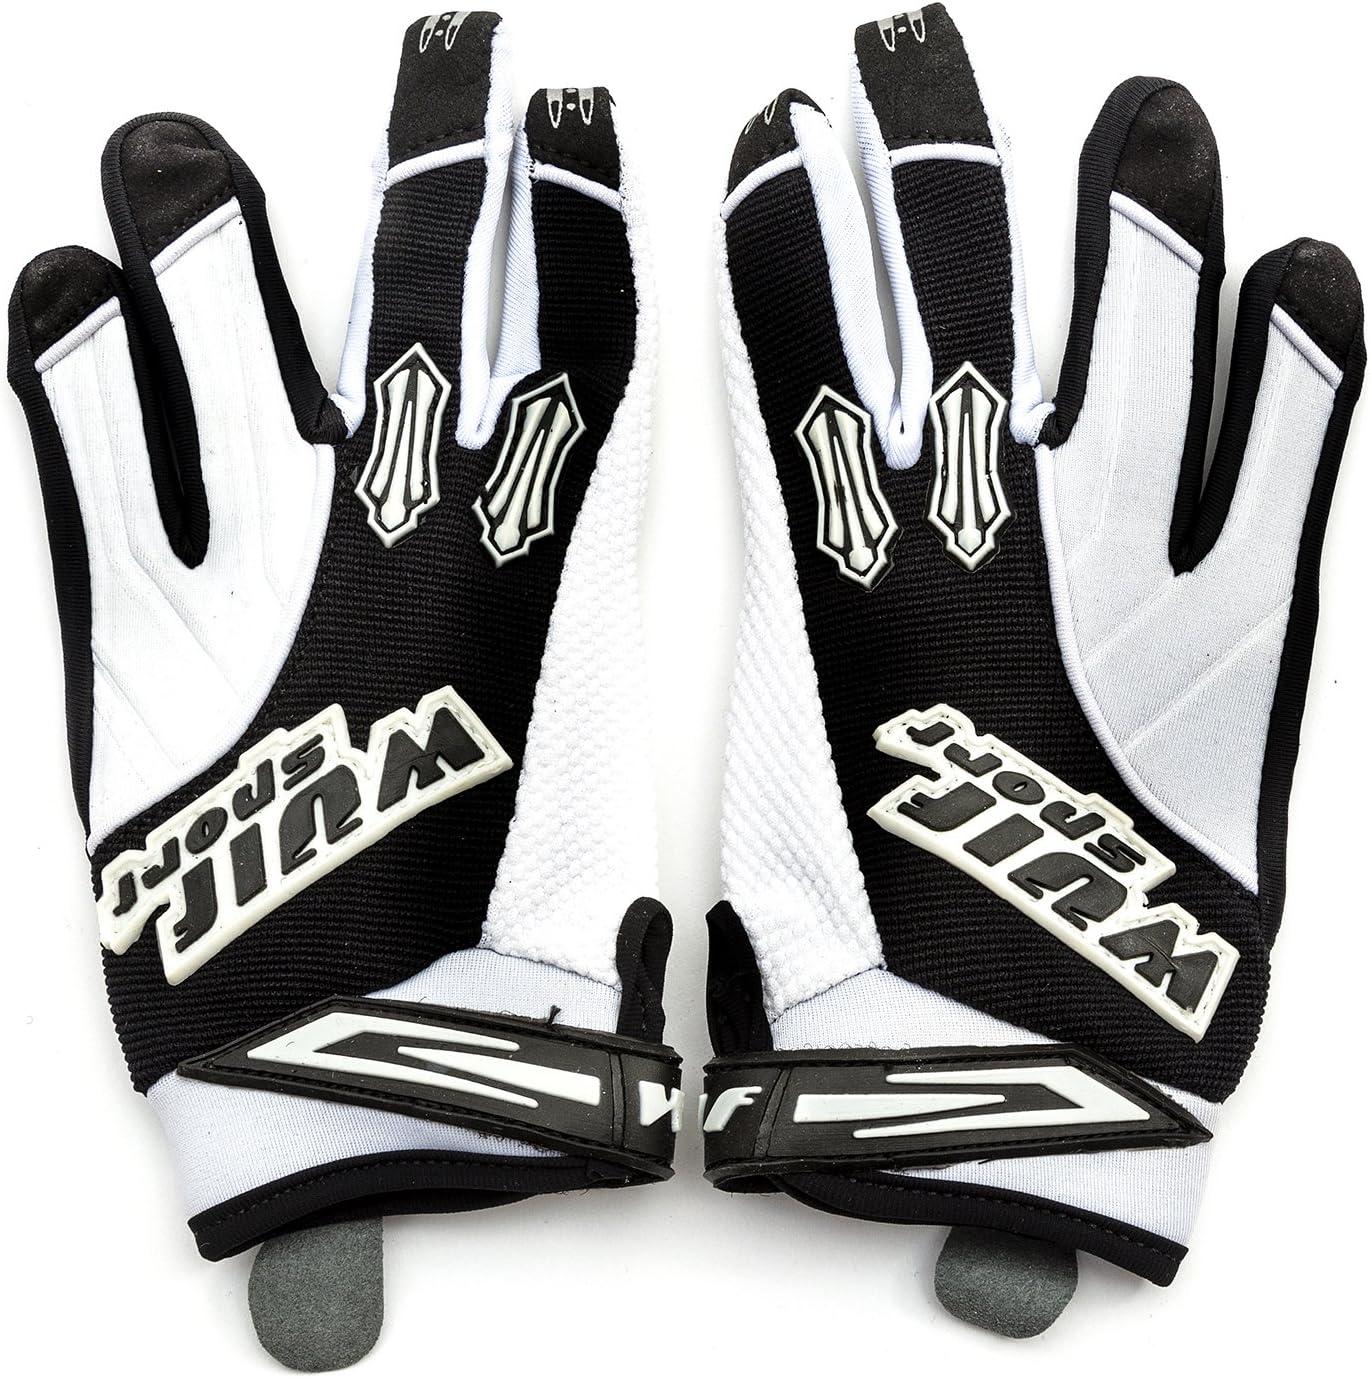 XXS 6-9 Years, White Wulfsport Kids Gloves Pair Stratos MX Junior Motocross Quad Biking